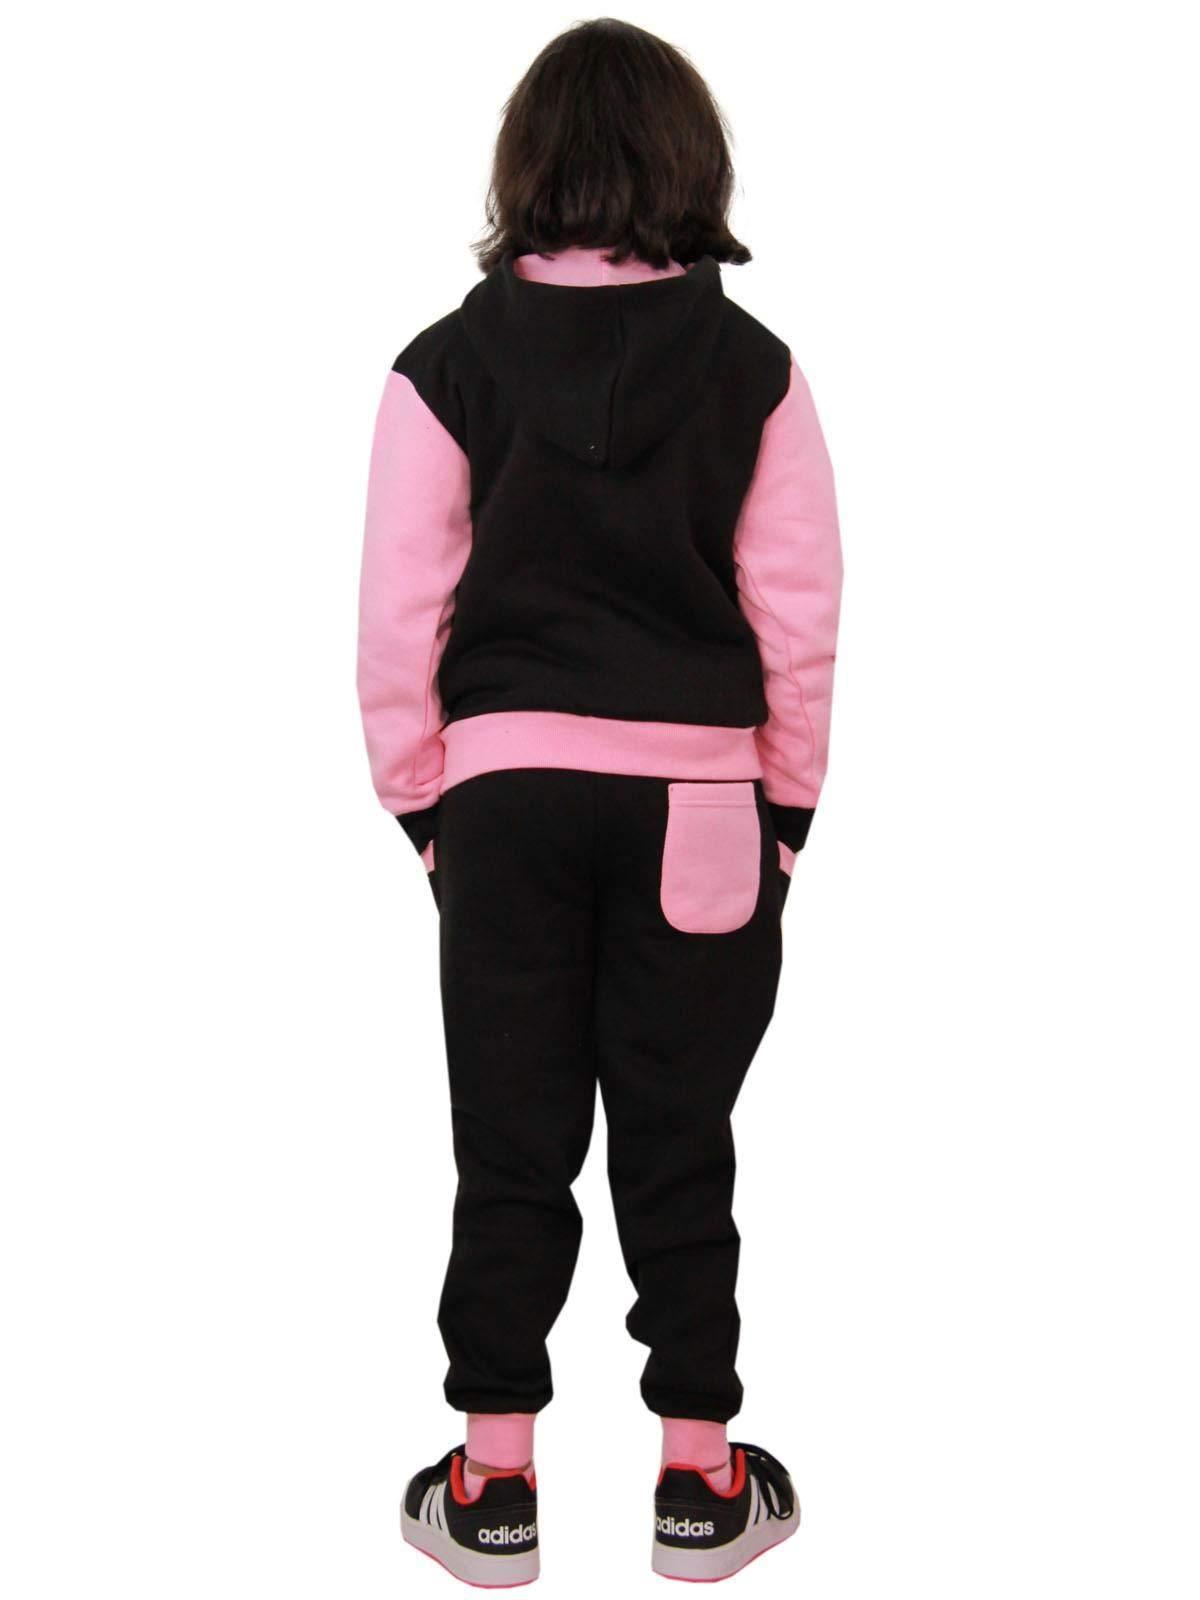 LOTMART Kids Plain Tracksuit Jumper in Pink 13-14 Years